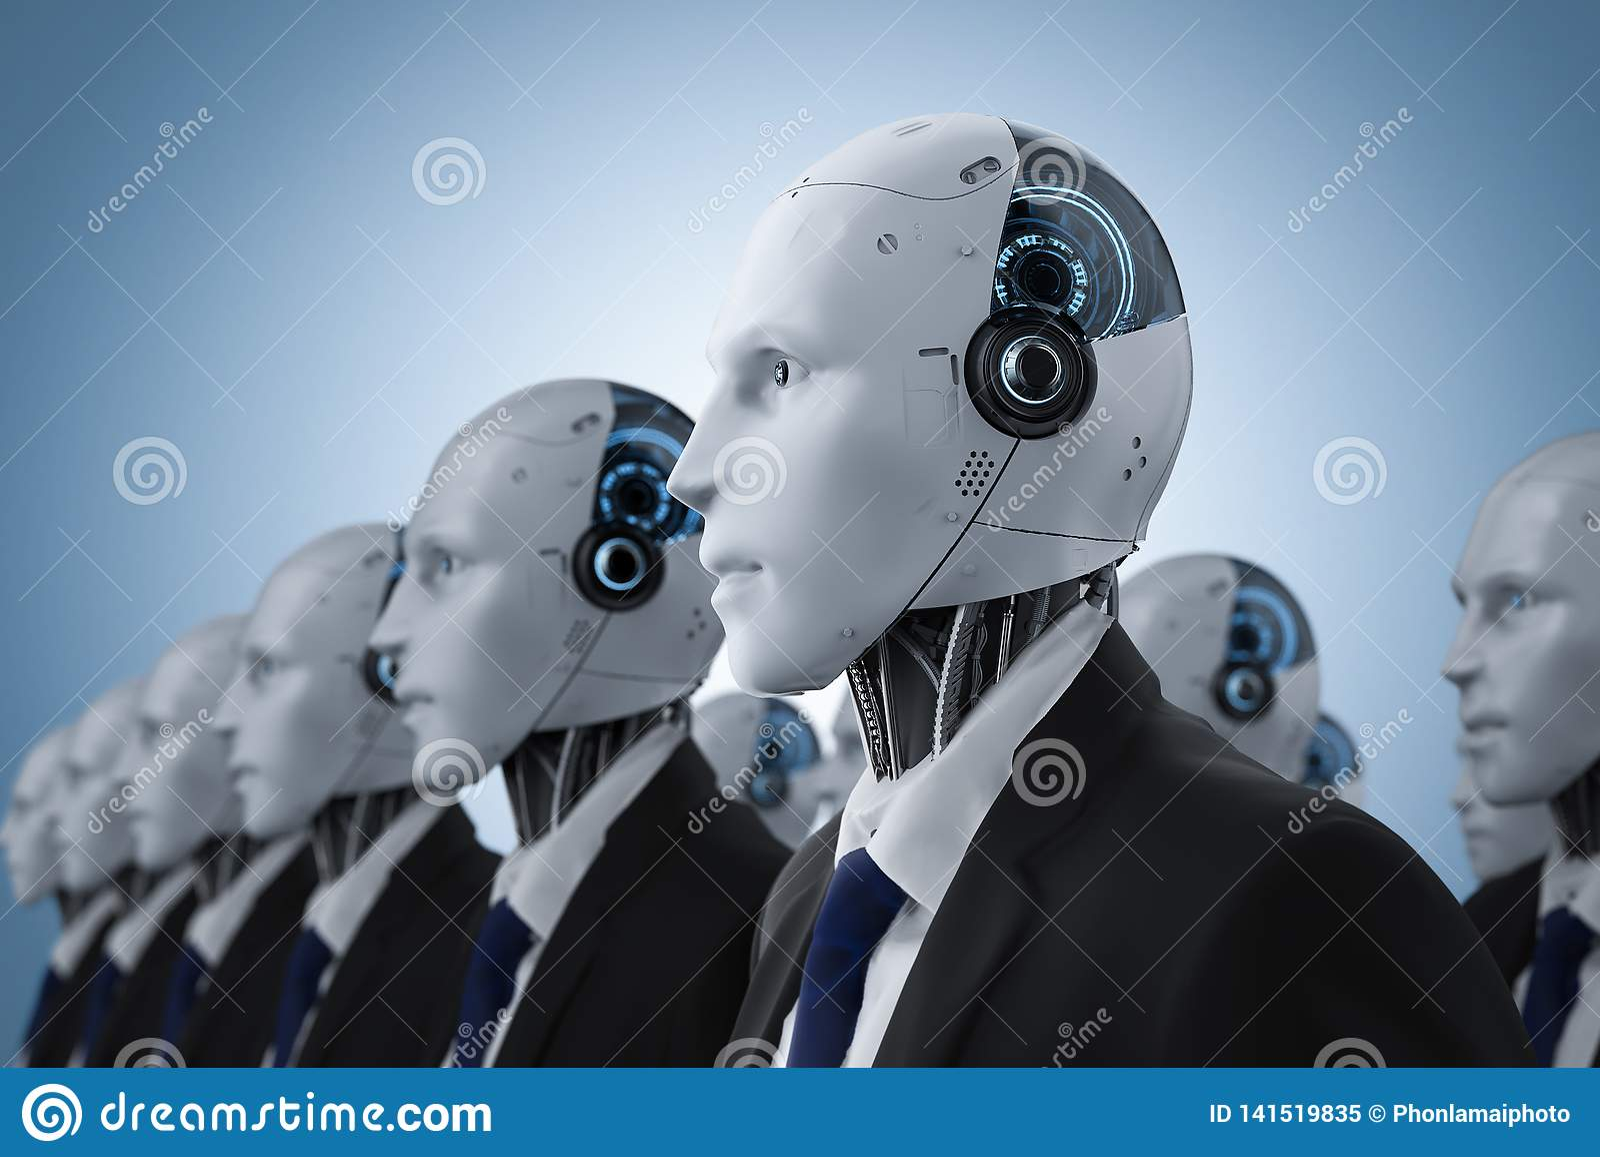 Group of robotic businessman